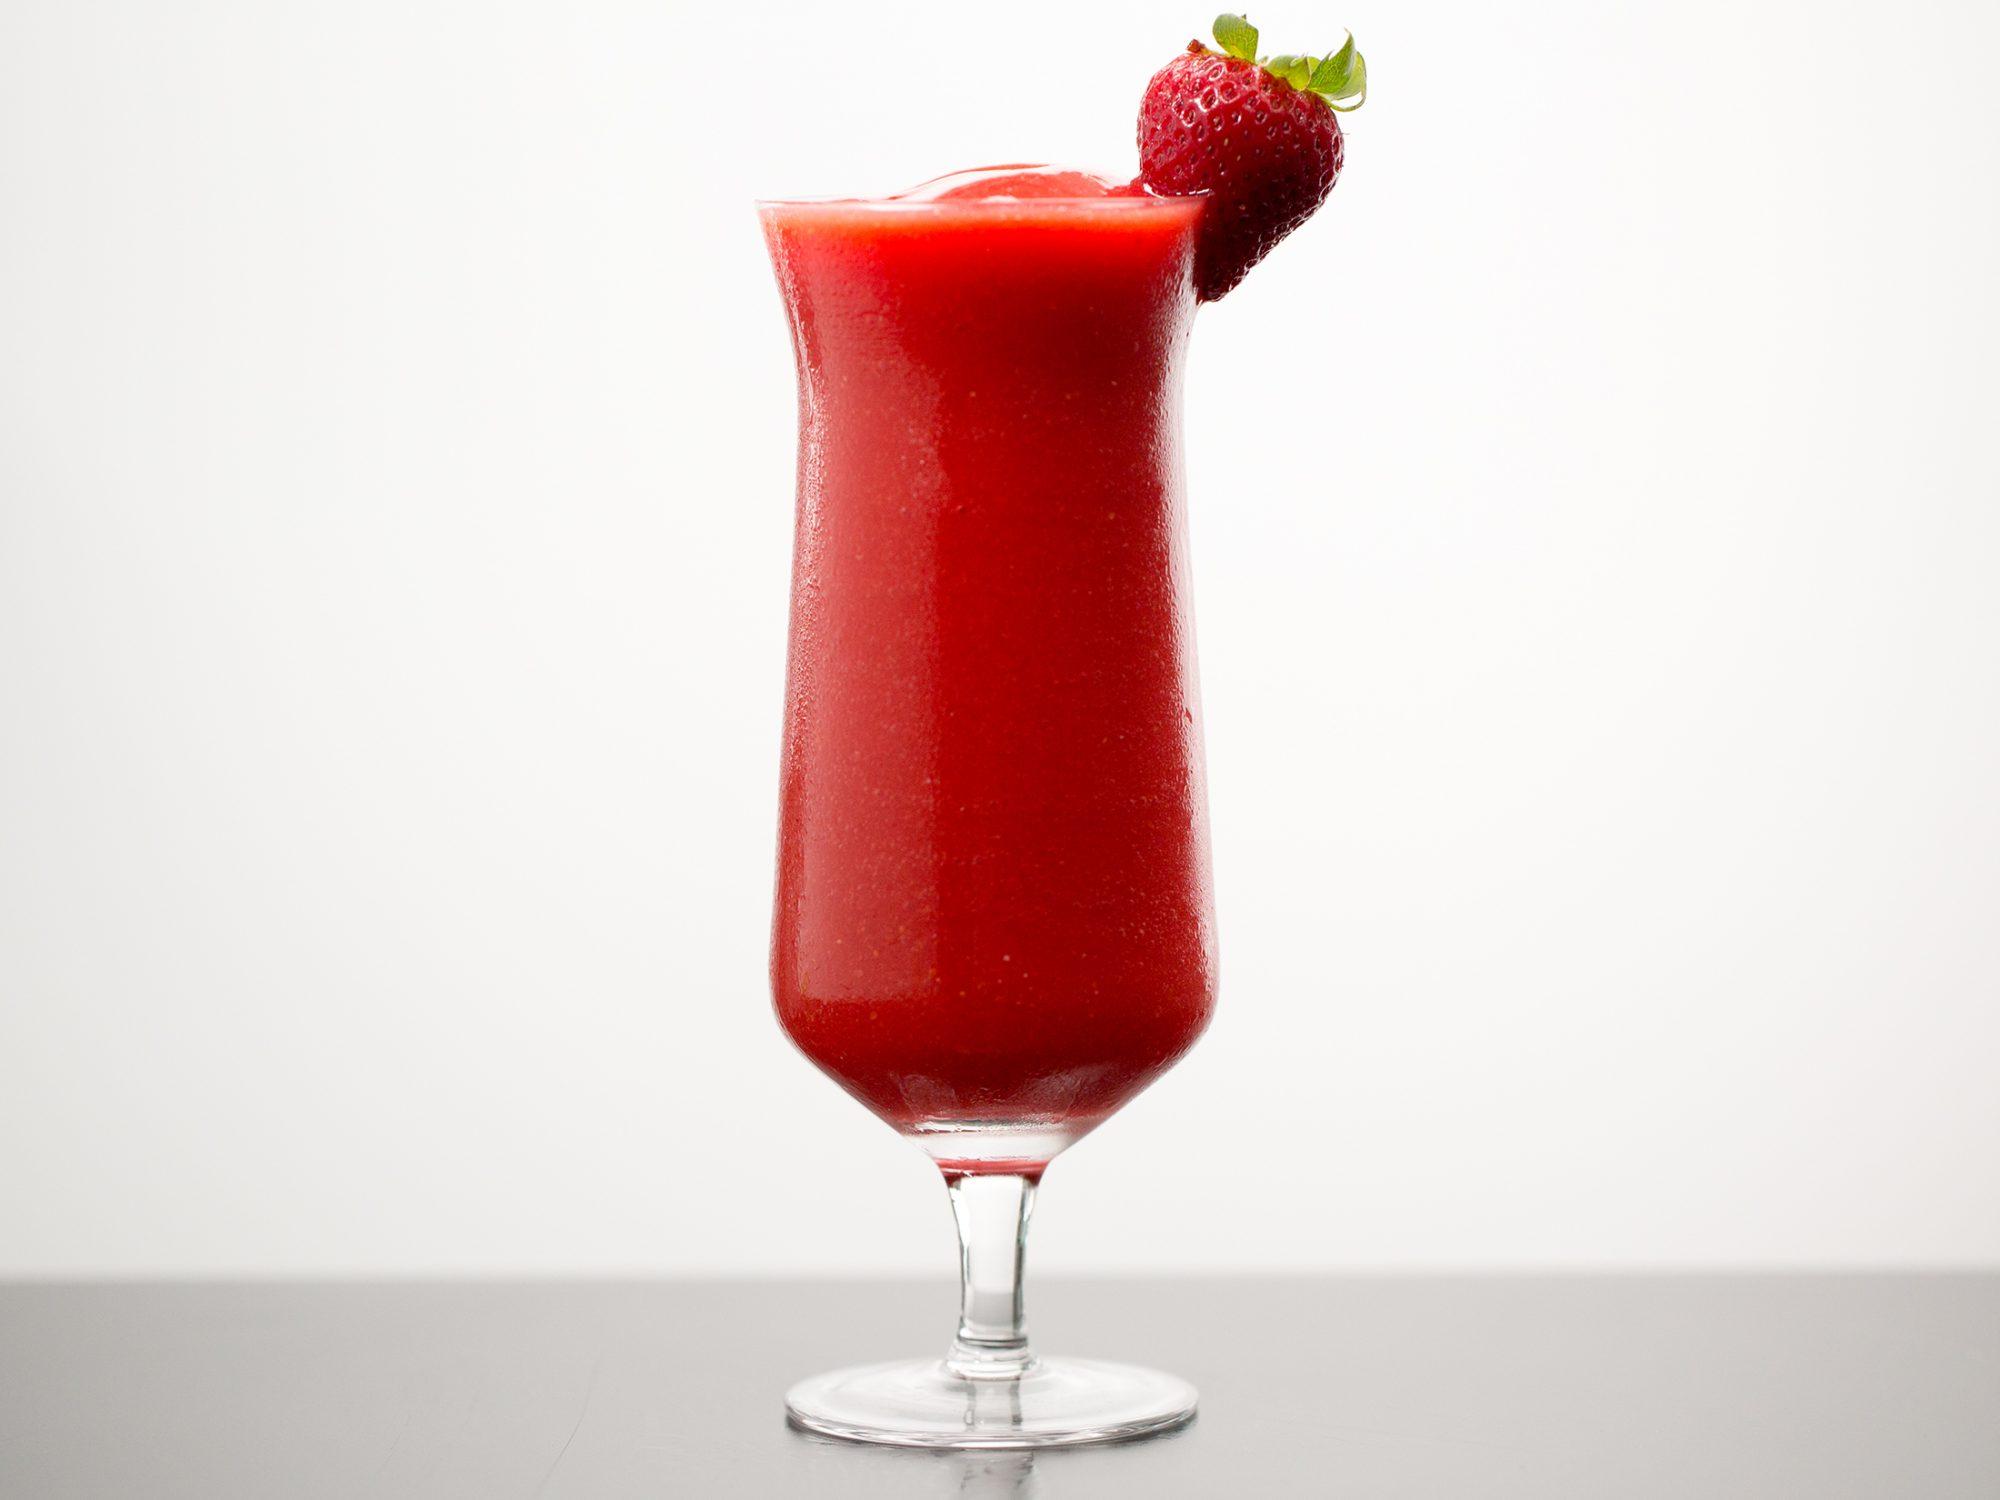 Simple Strawberry Daquiri image